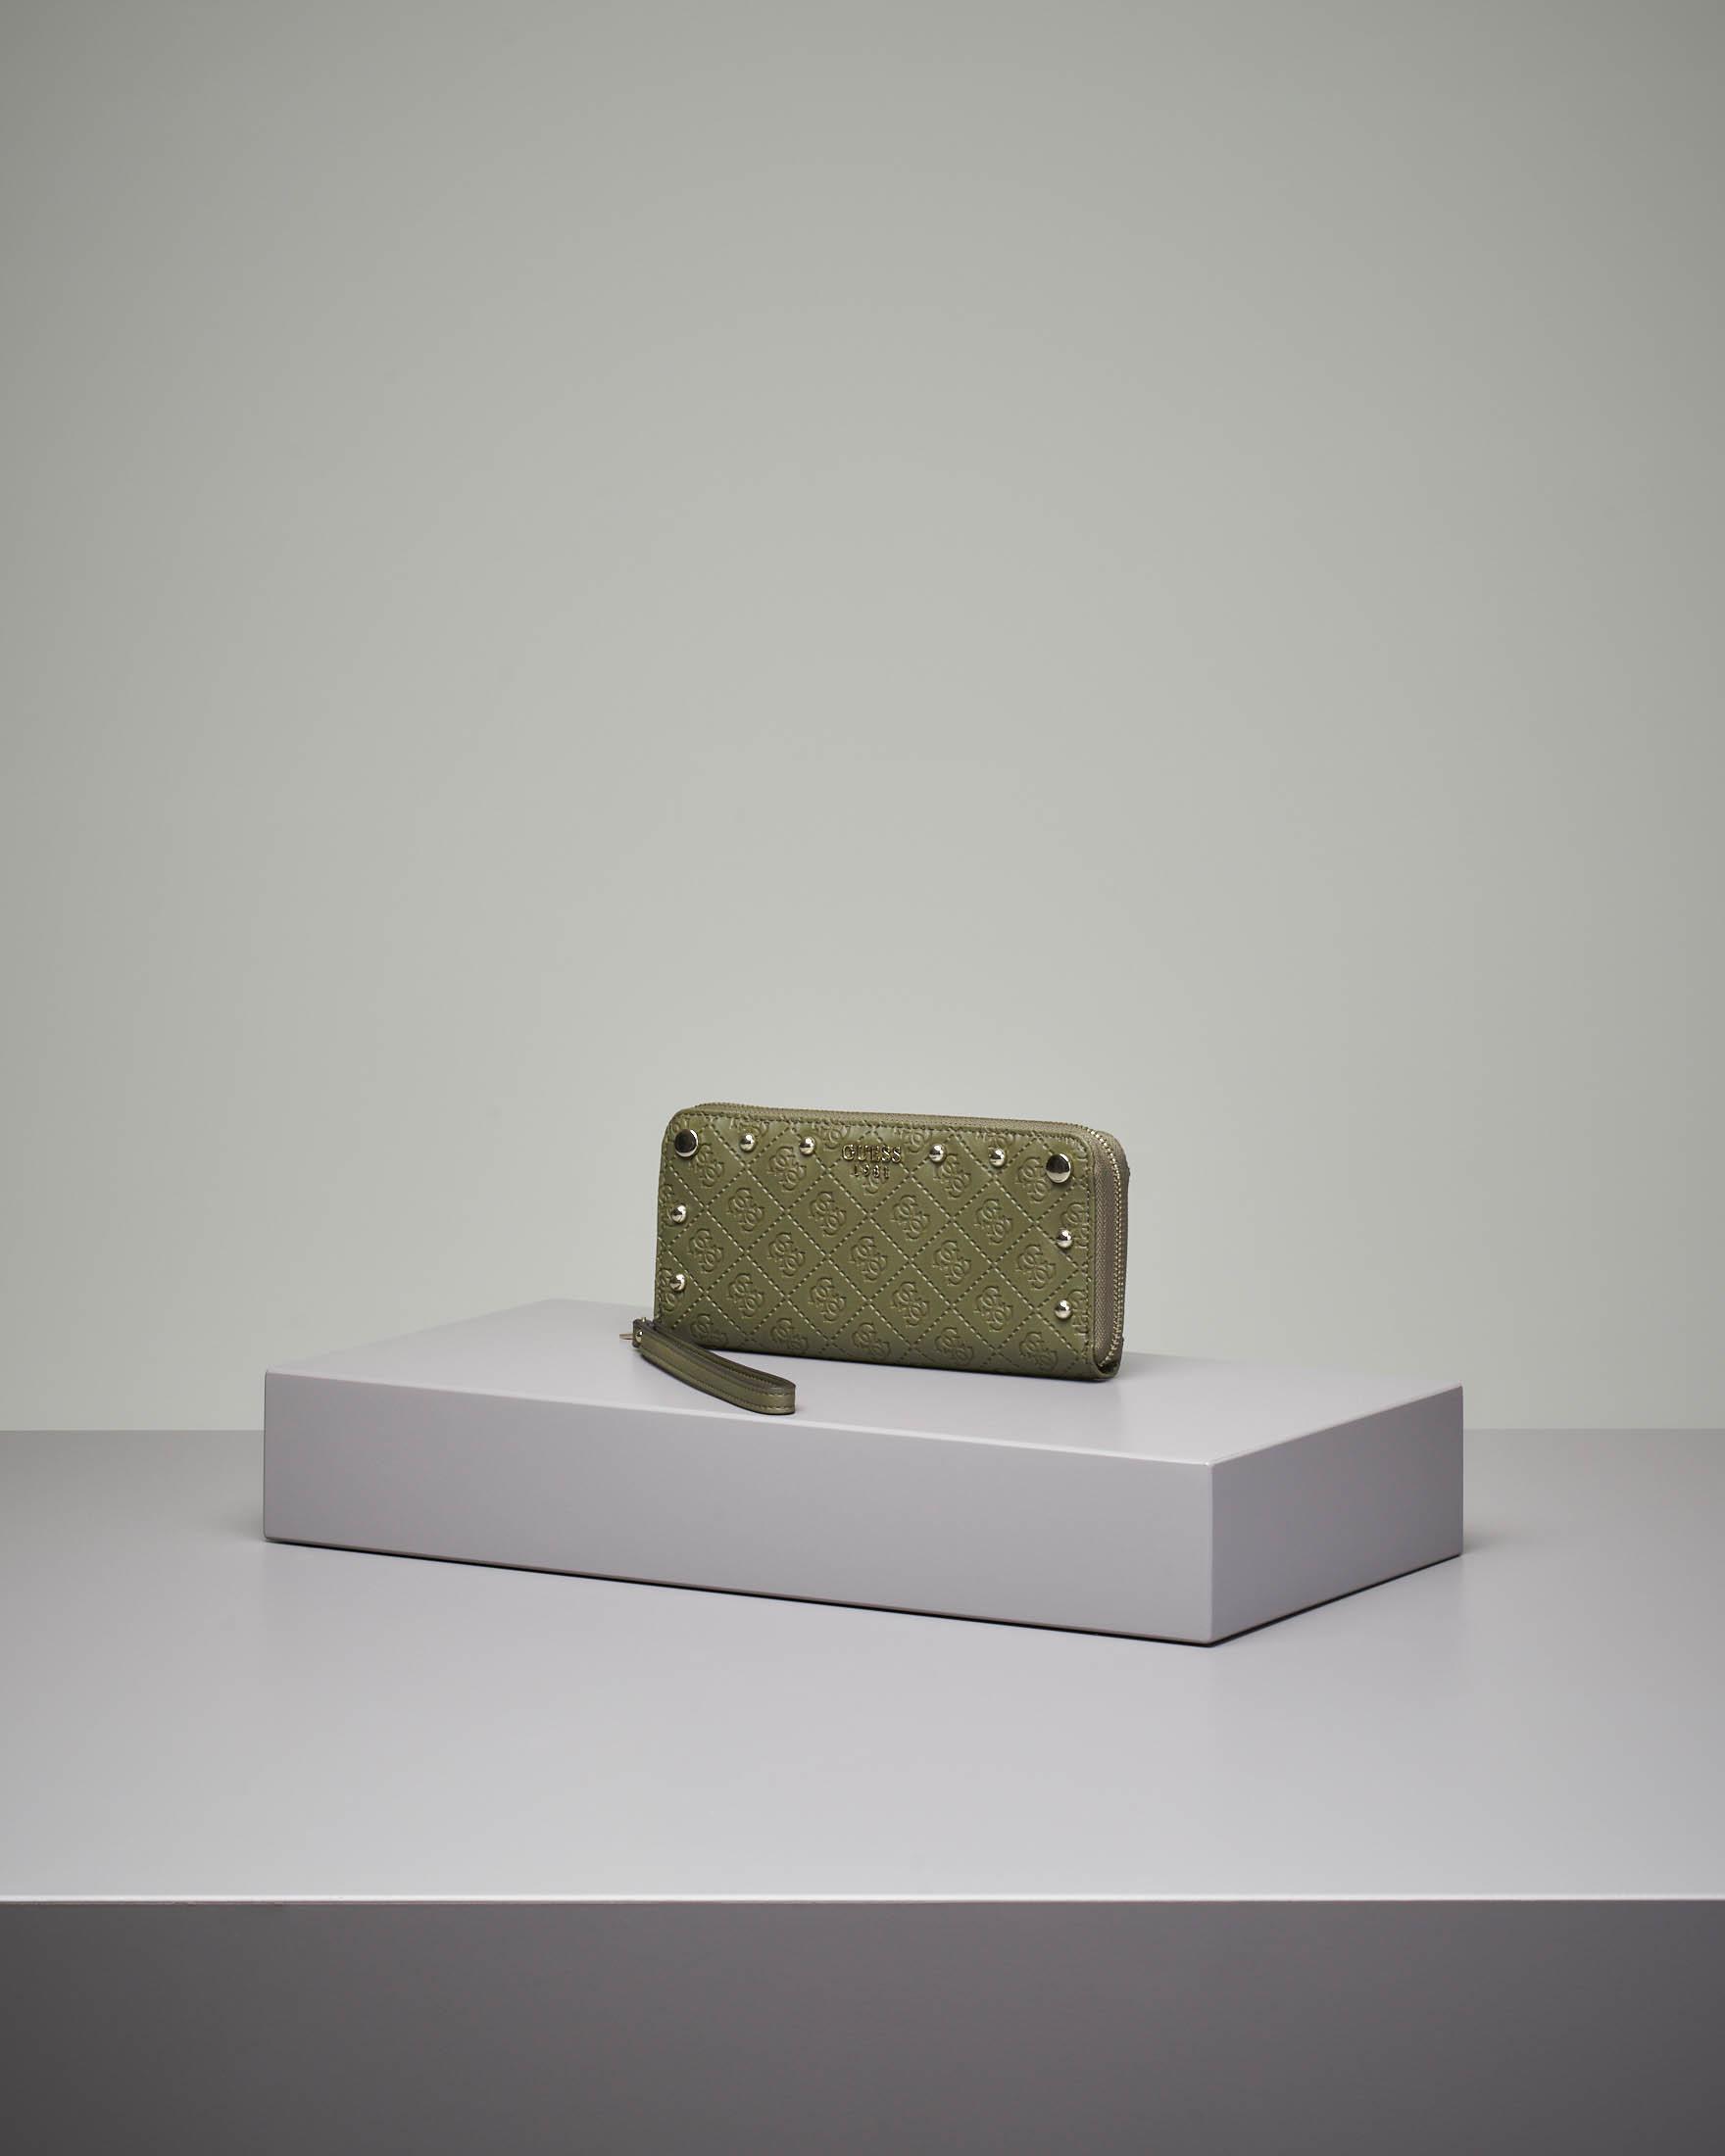 Portafoglio verde grande con chiusura a cerniera fantasia a logo